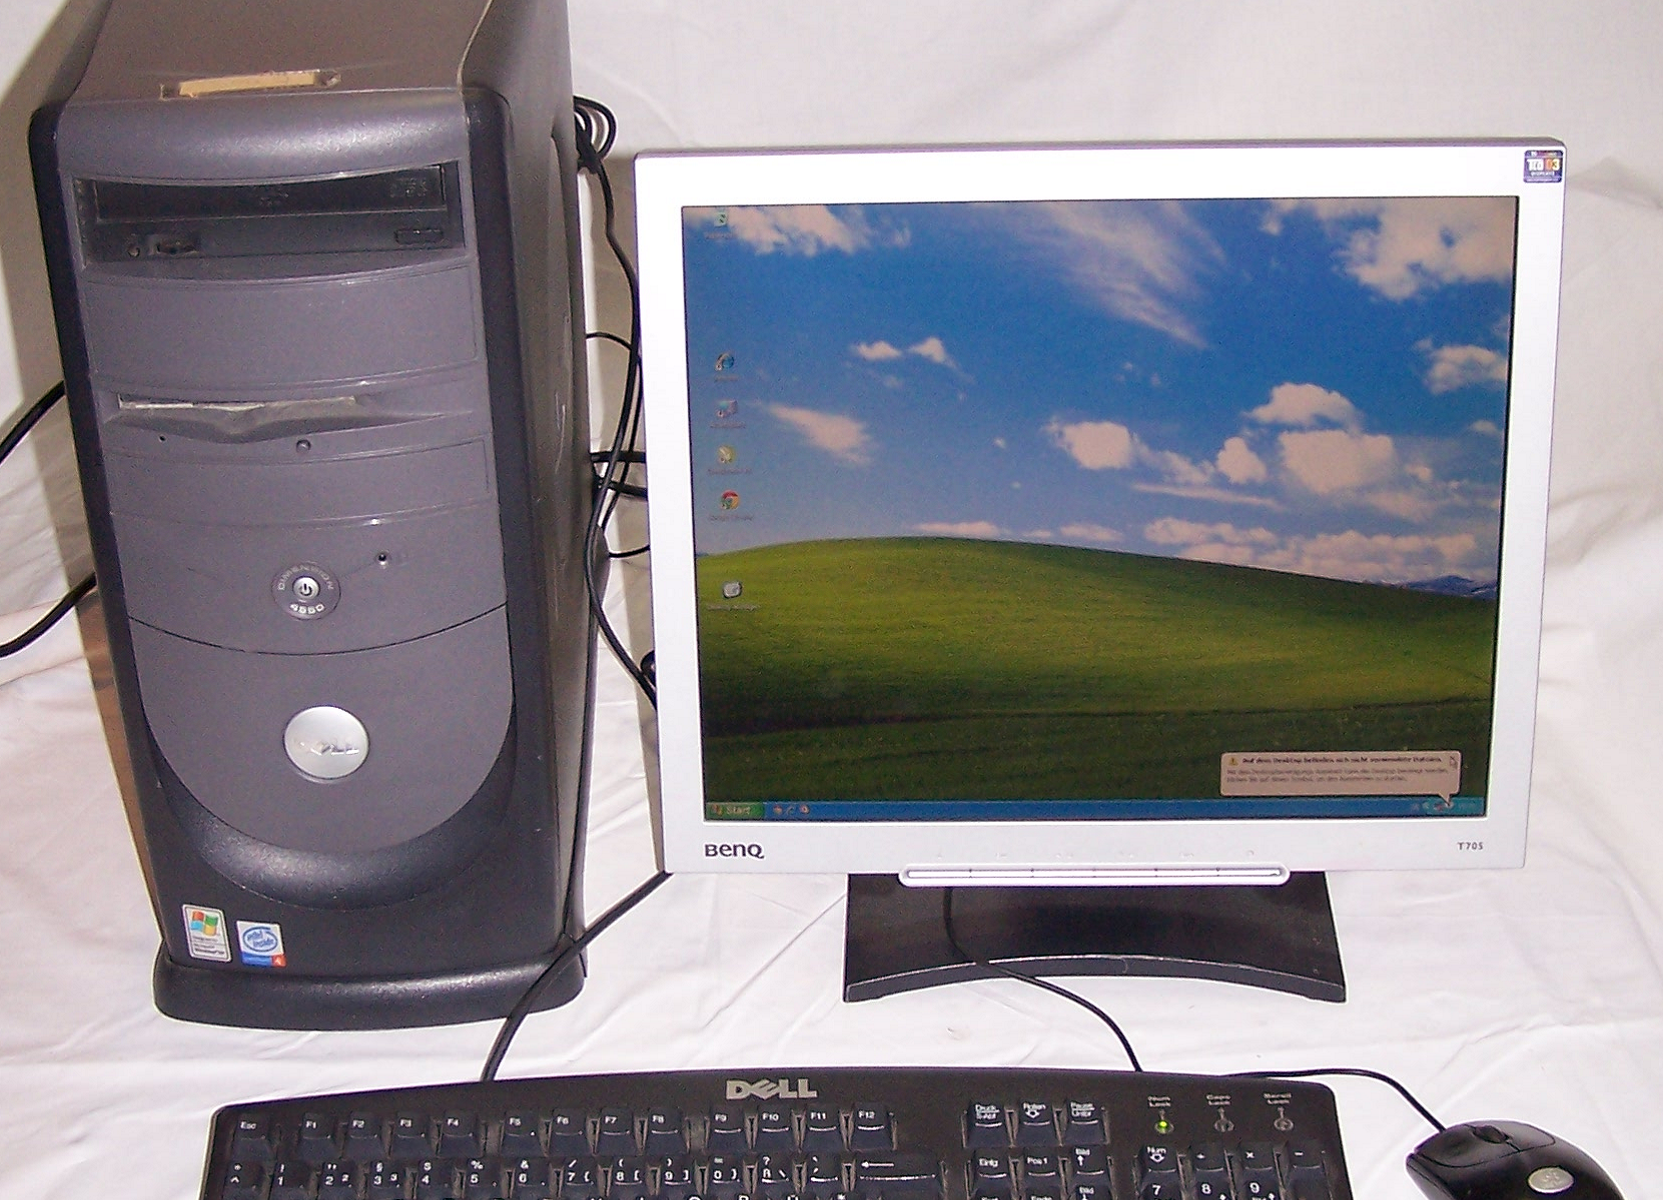 Büro - IT & Kommunikation - Arbeitsplatzrechner Dell Dimension 4550